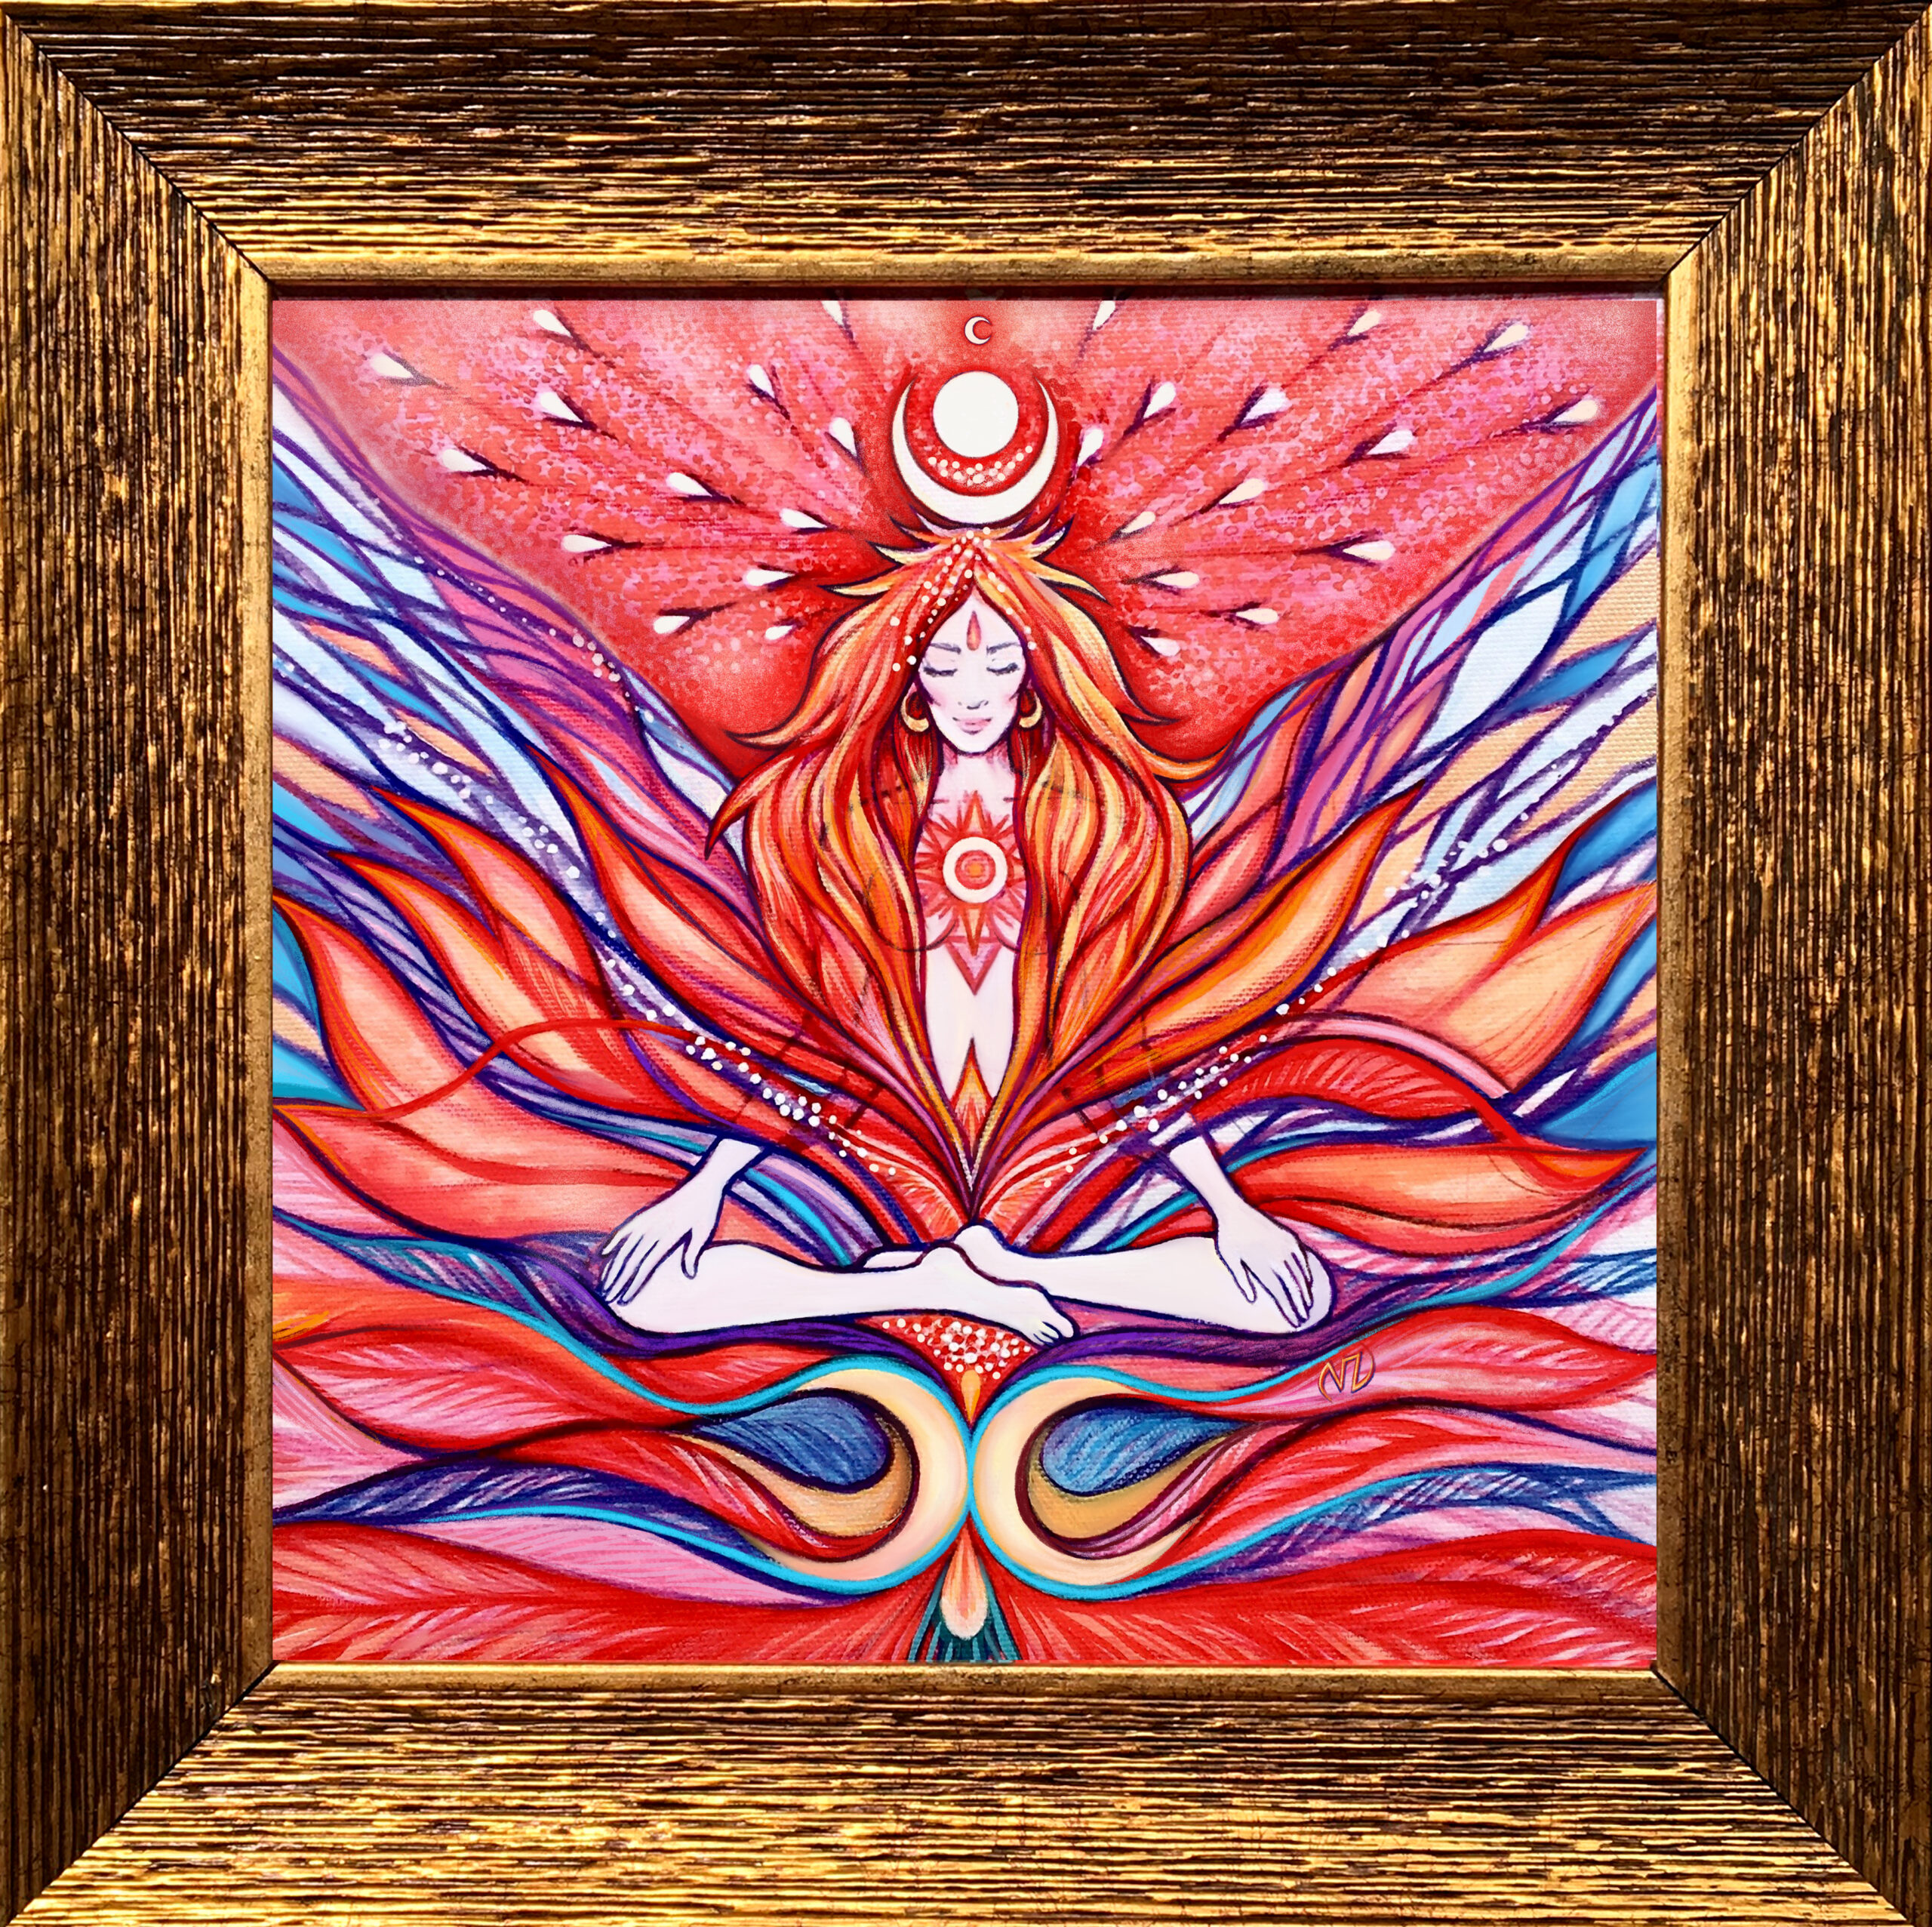 03.35x35-Lakshmi-ViorikaZagorowska-ArtForSale.fr